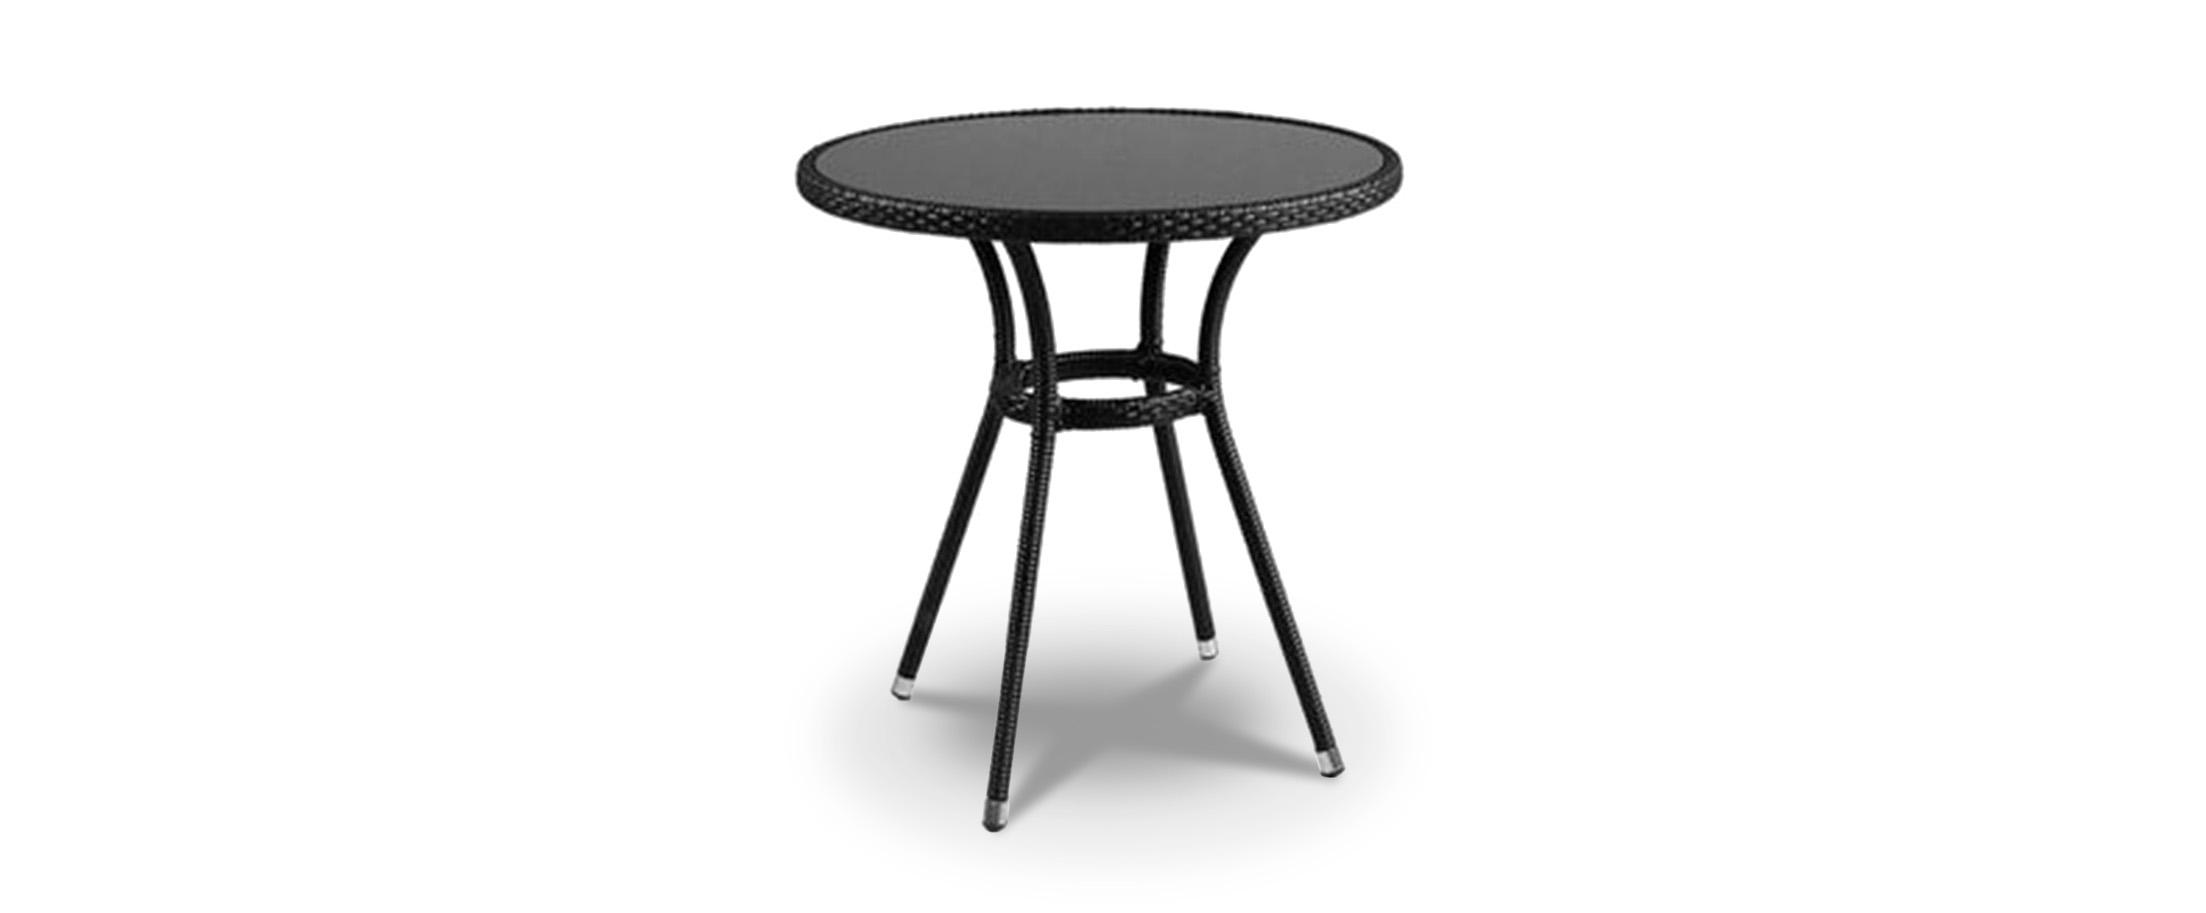 Стол круглый Модель 296 от MOON TRADE